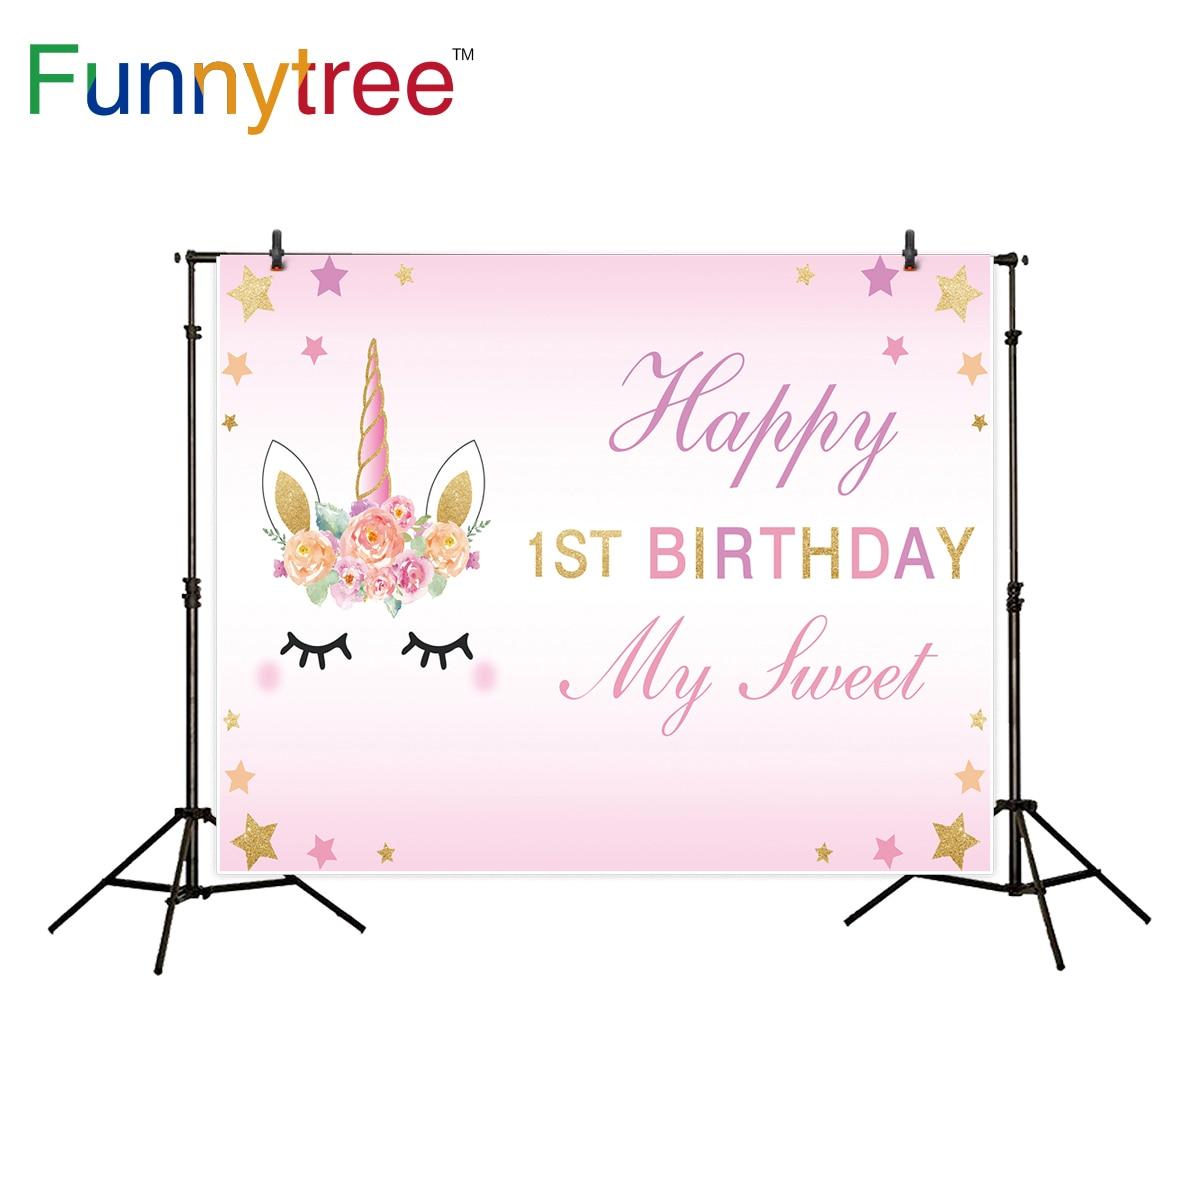 Photo Studio Background Humor Sunsfun 7x5ft Pink Unicorn Photography Backdrop Birthday Flower Banner Dessert Table Background Photobooth Photocall 220x150cm